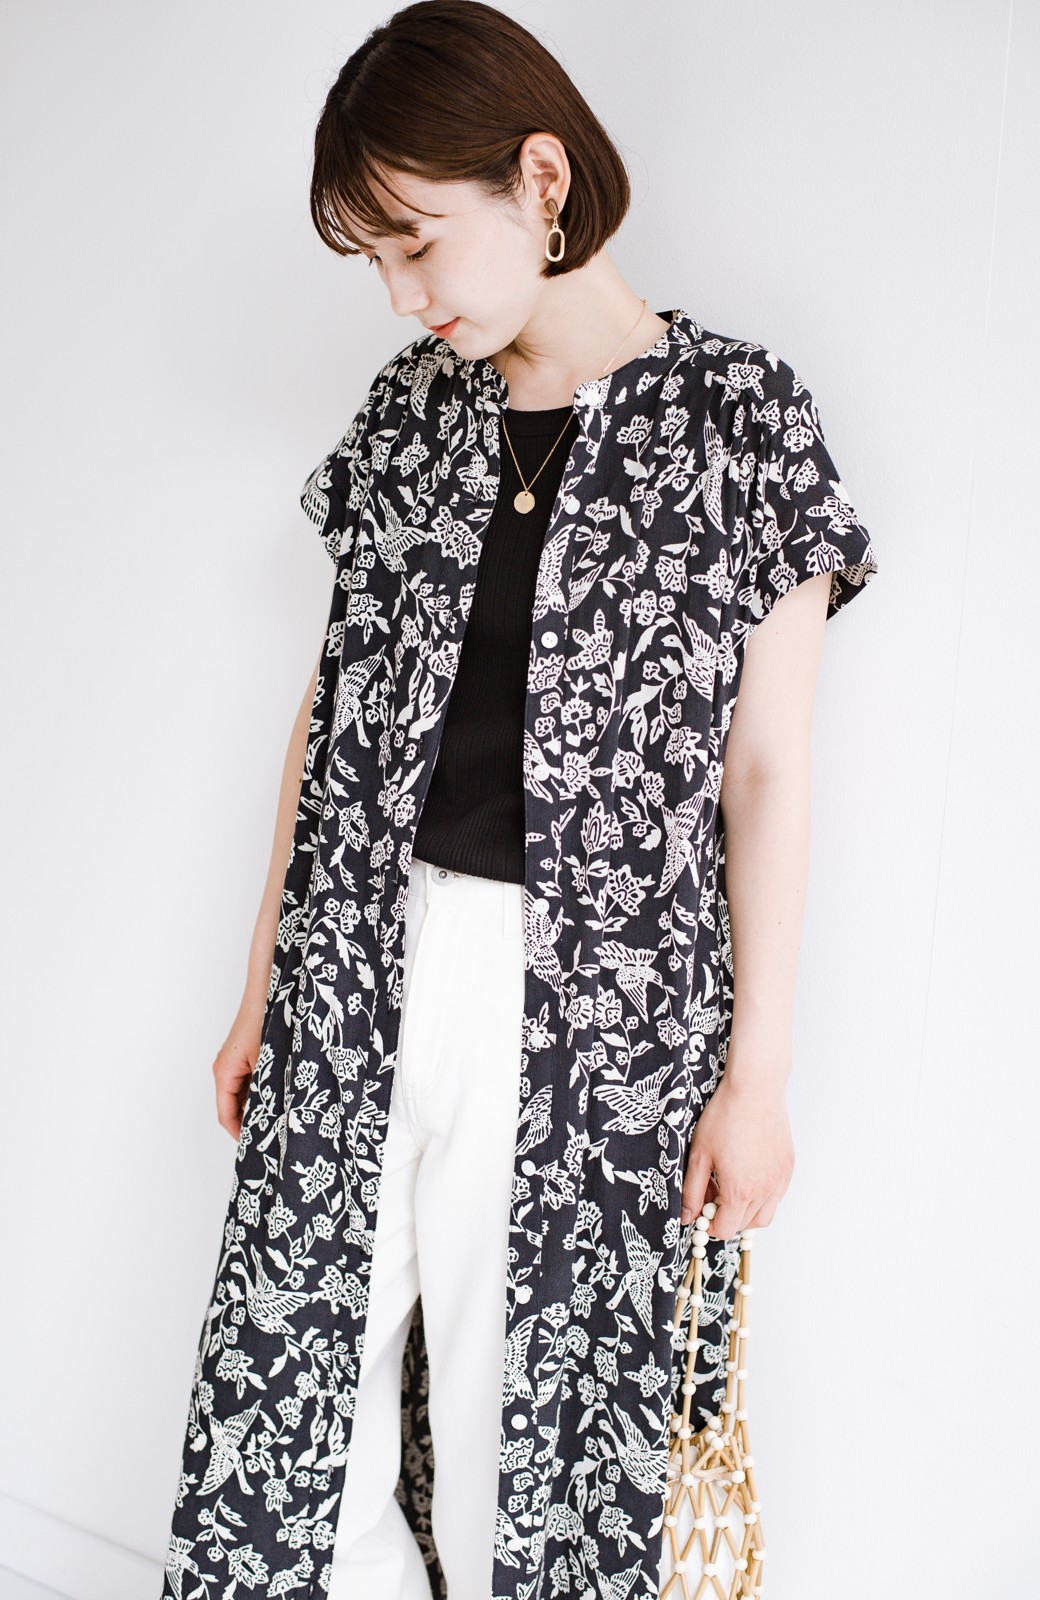 haco! 京都の浴衣屋さんと作った浴衣生地の羽織ってもかわいいロングワンピース <ブラック系その他>の商品写真6